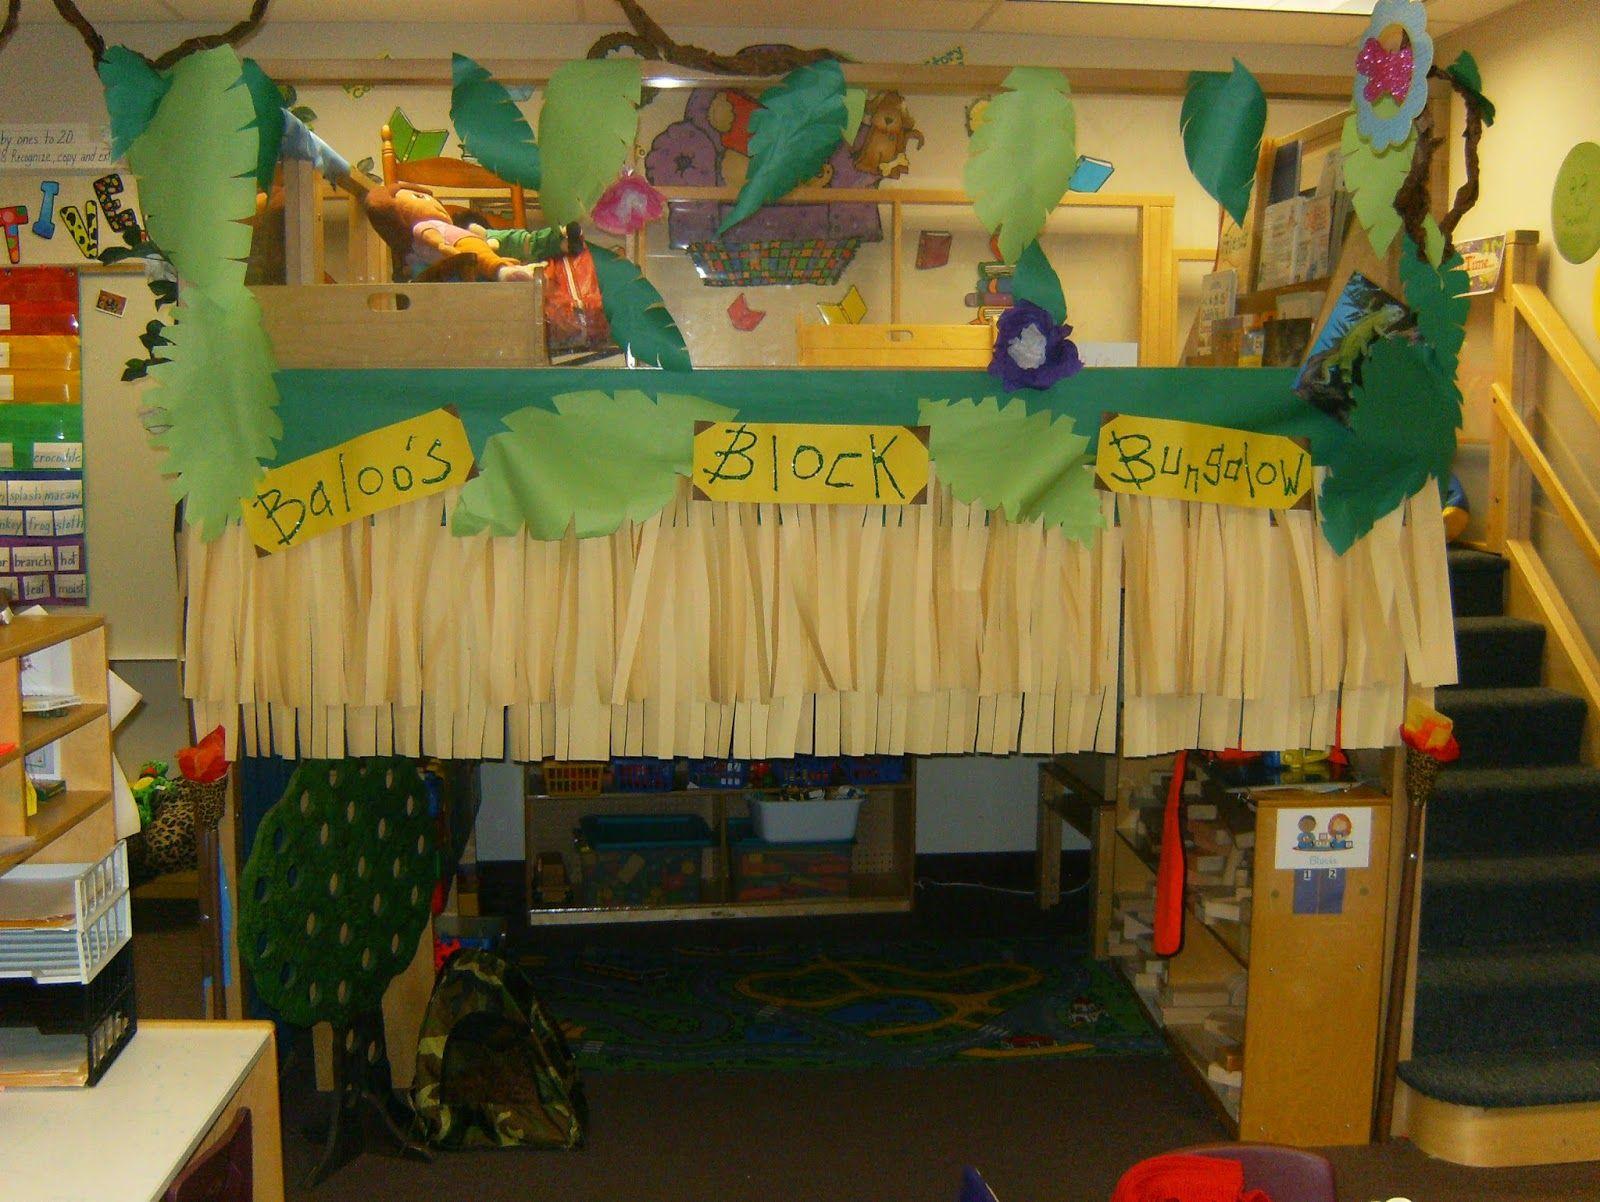 Baloo S Block Bunglow Center Preschool Decoration Jungle Rainforest Theme